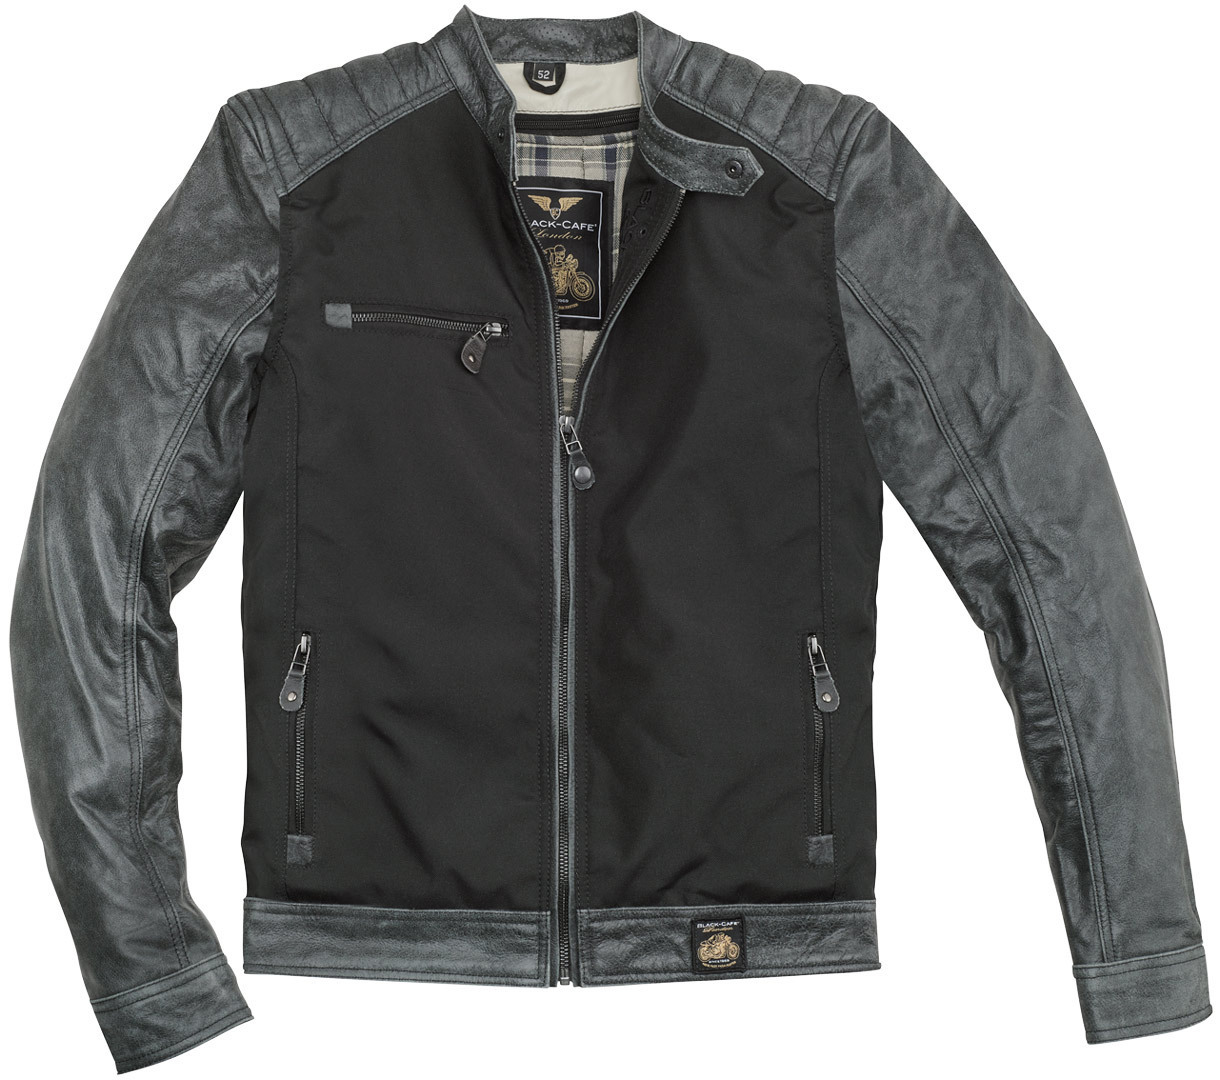 Black-Cafe London Johannesburg Motorrad Leder- / Textiljacke, schwarz-grau, Größe 58, schwarz-grau, Größe 58